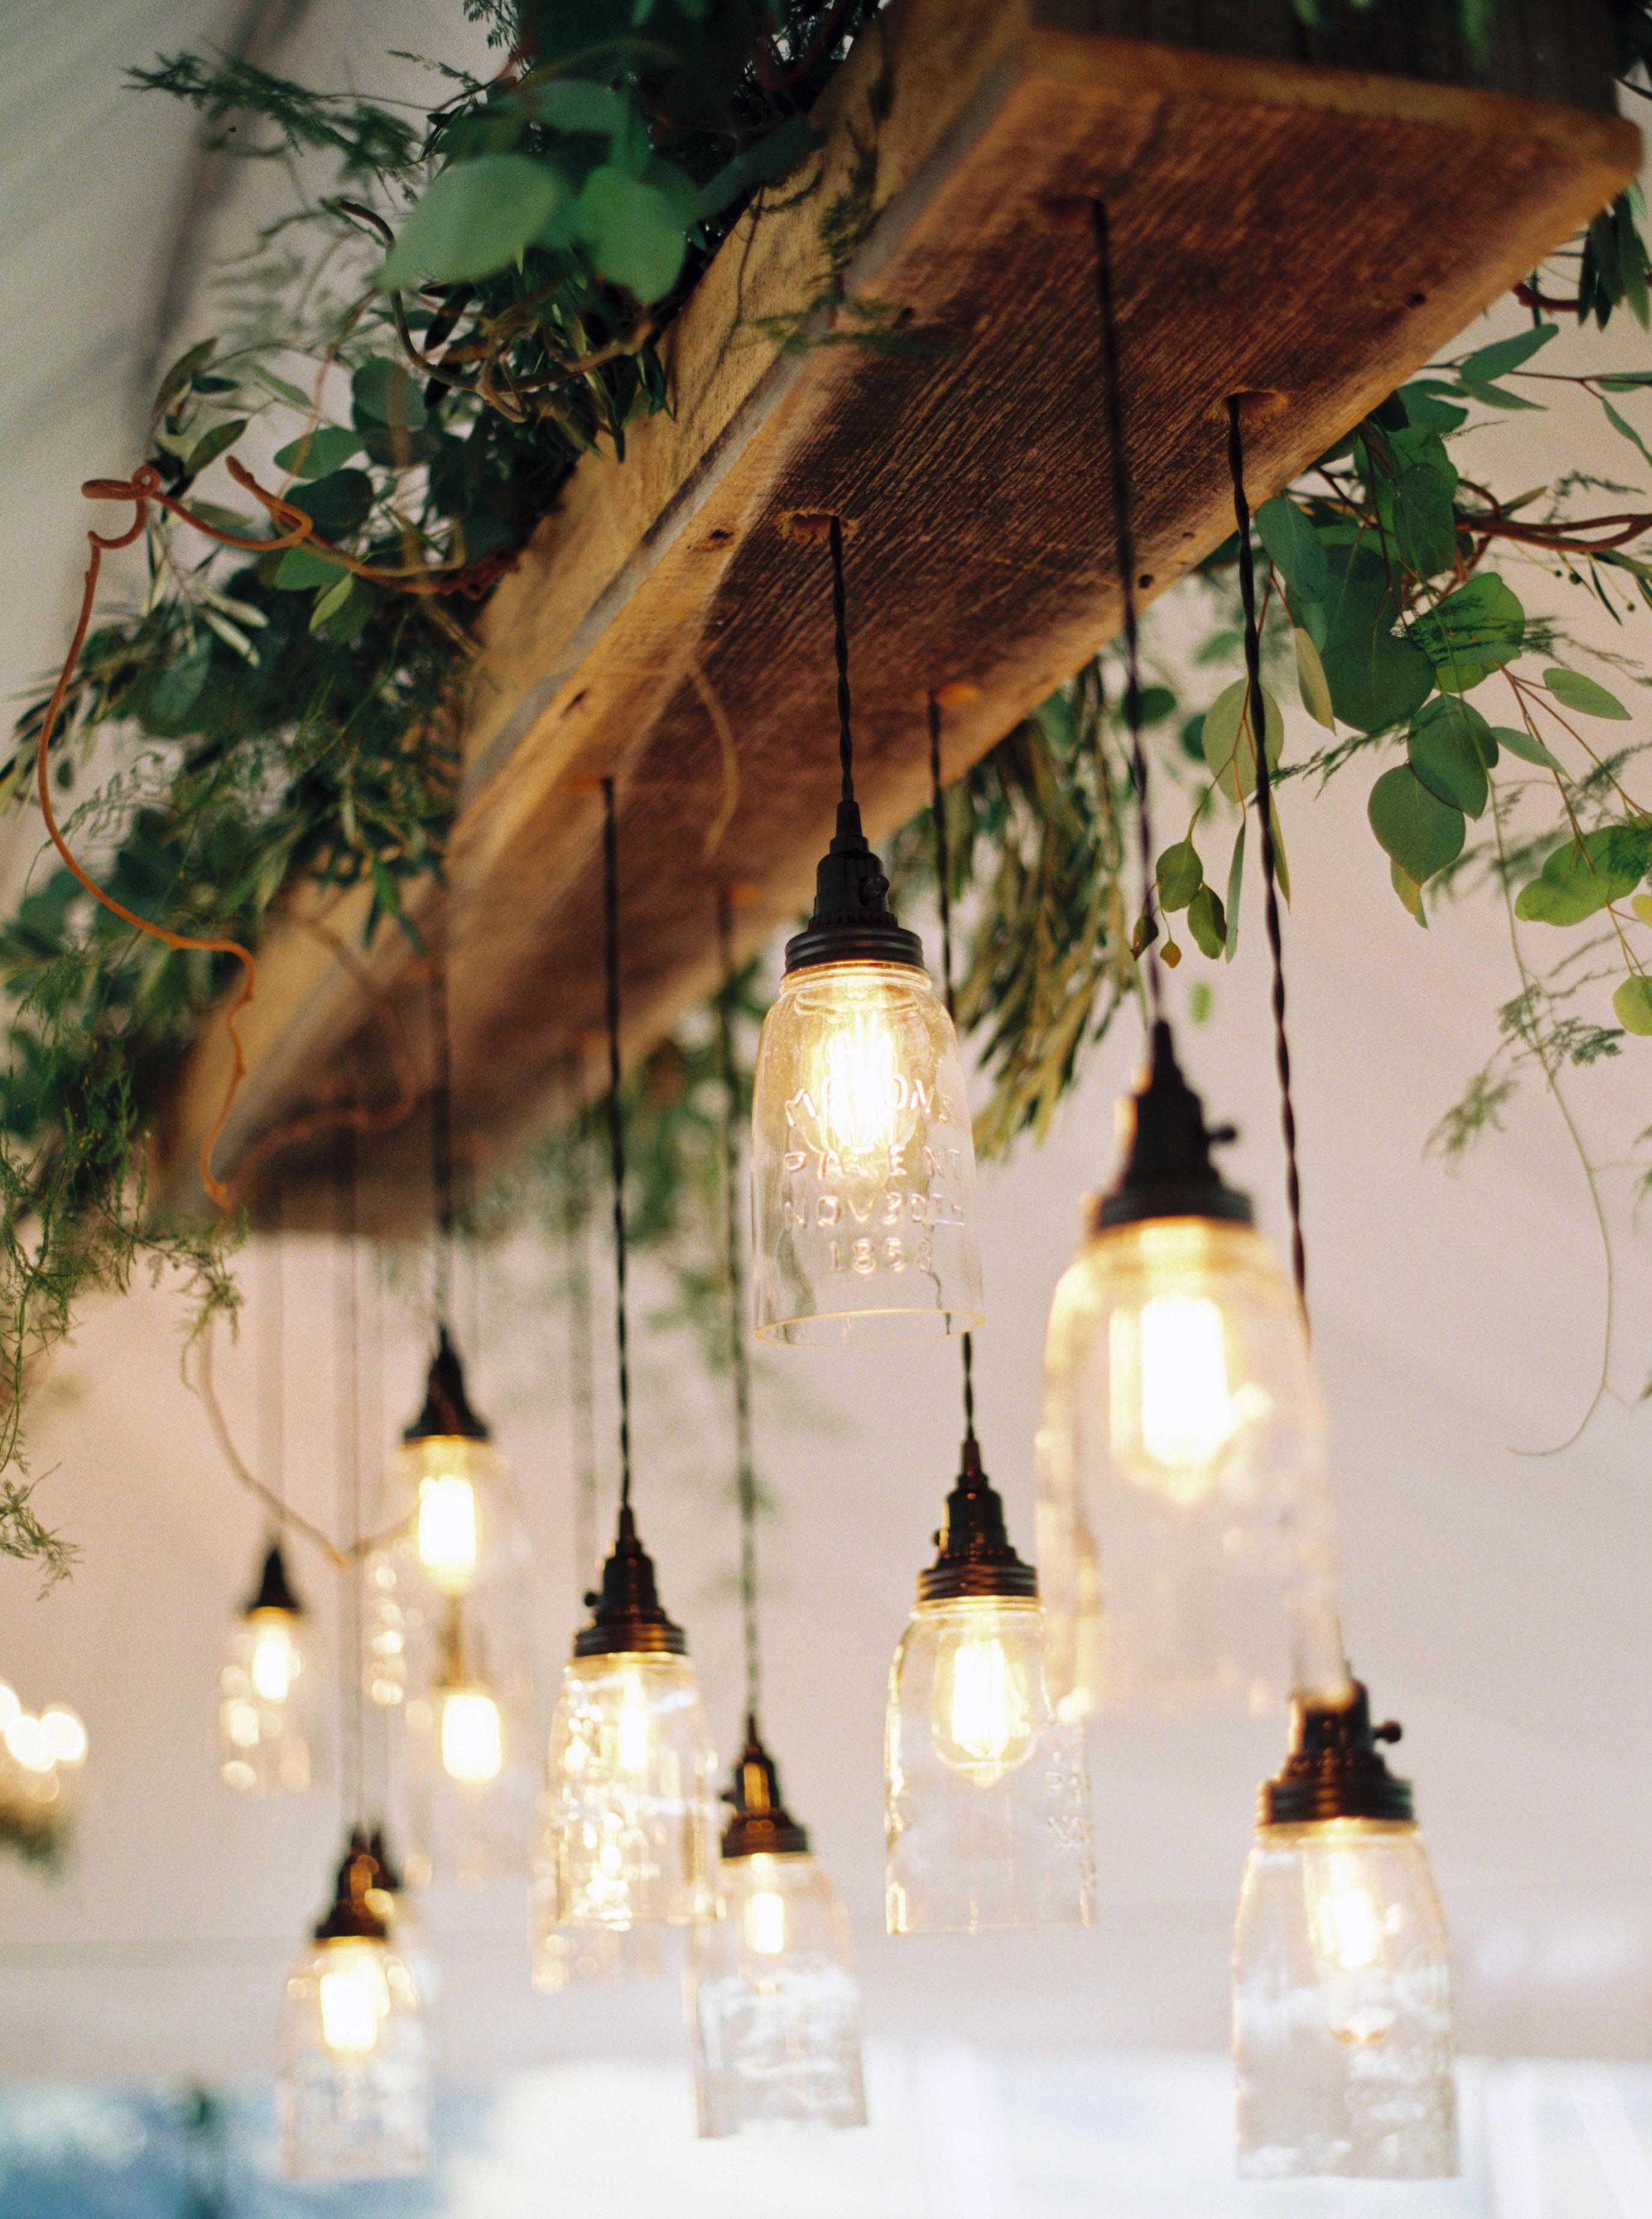 mason jar hanging lights from wood beam with greenery